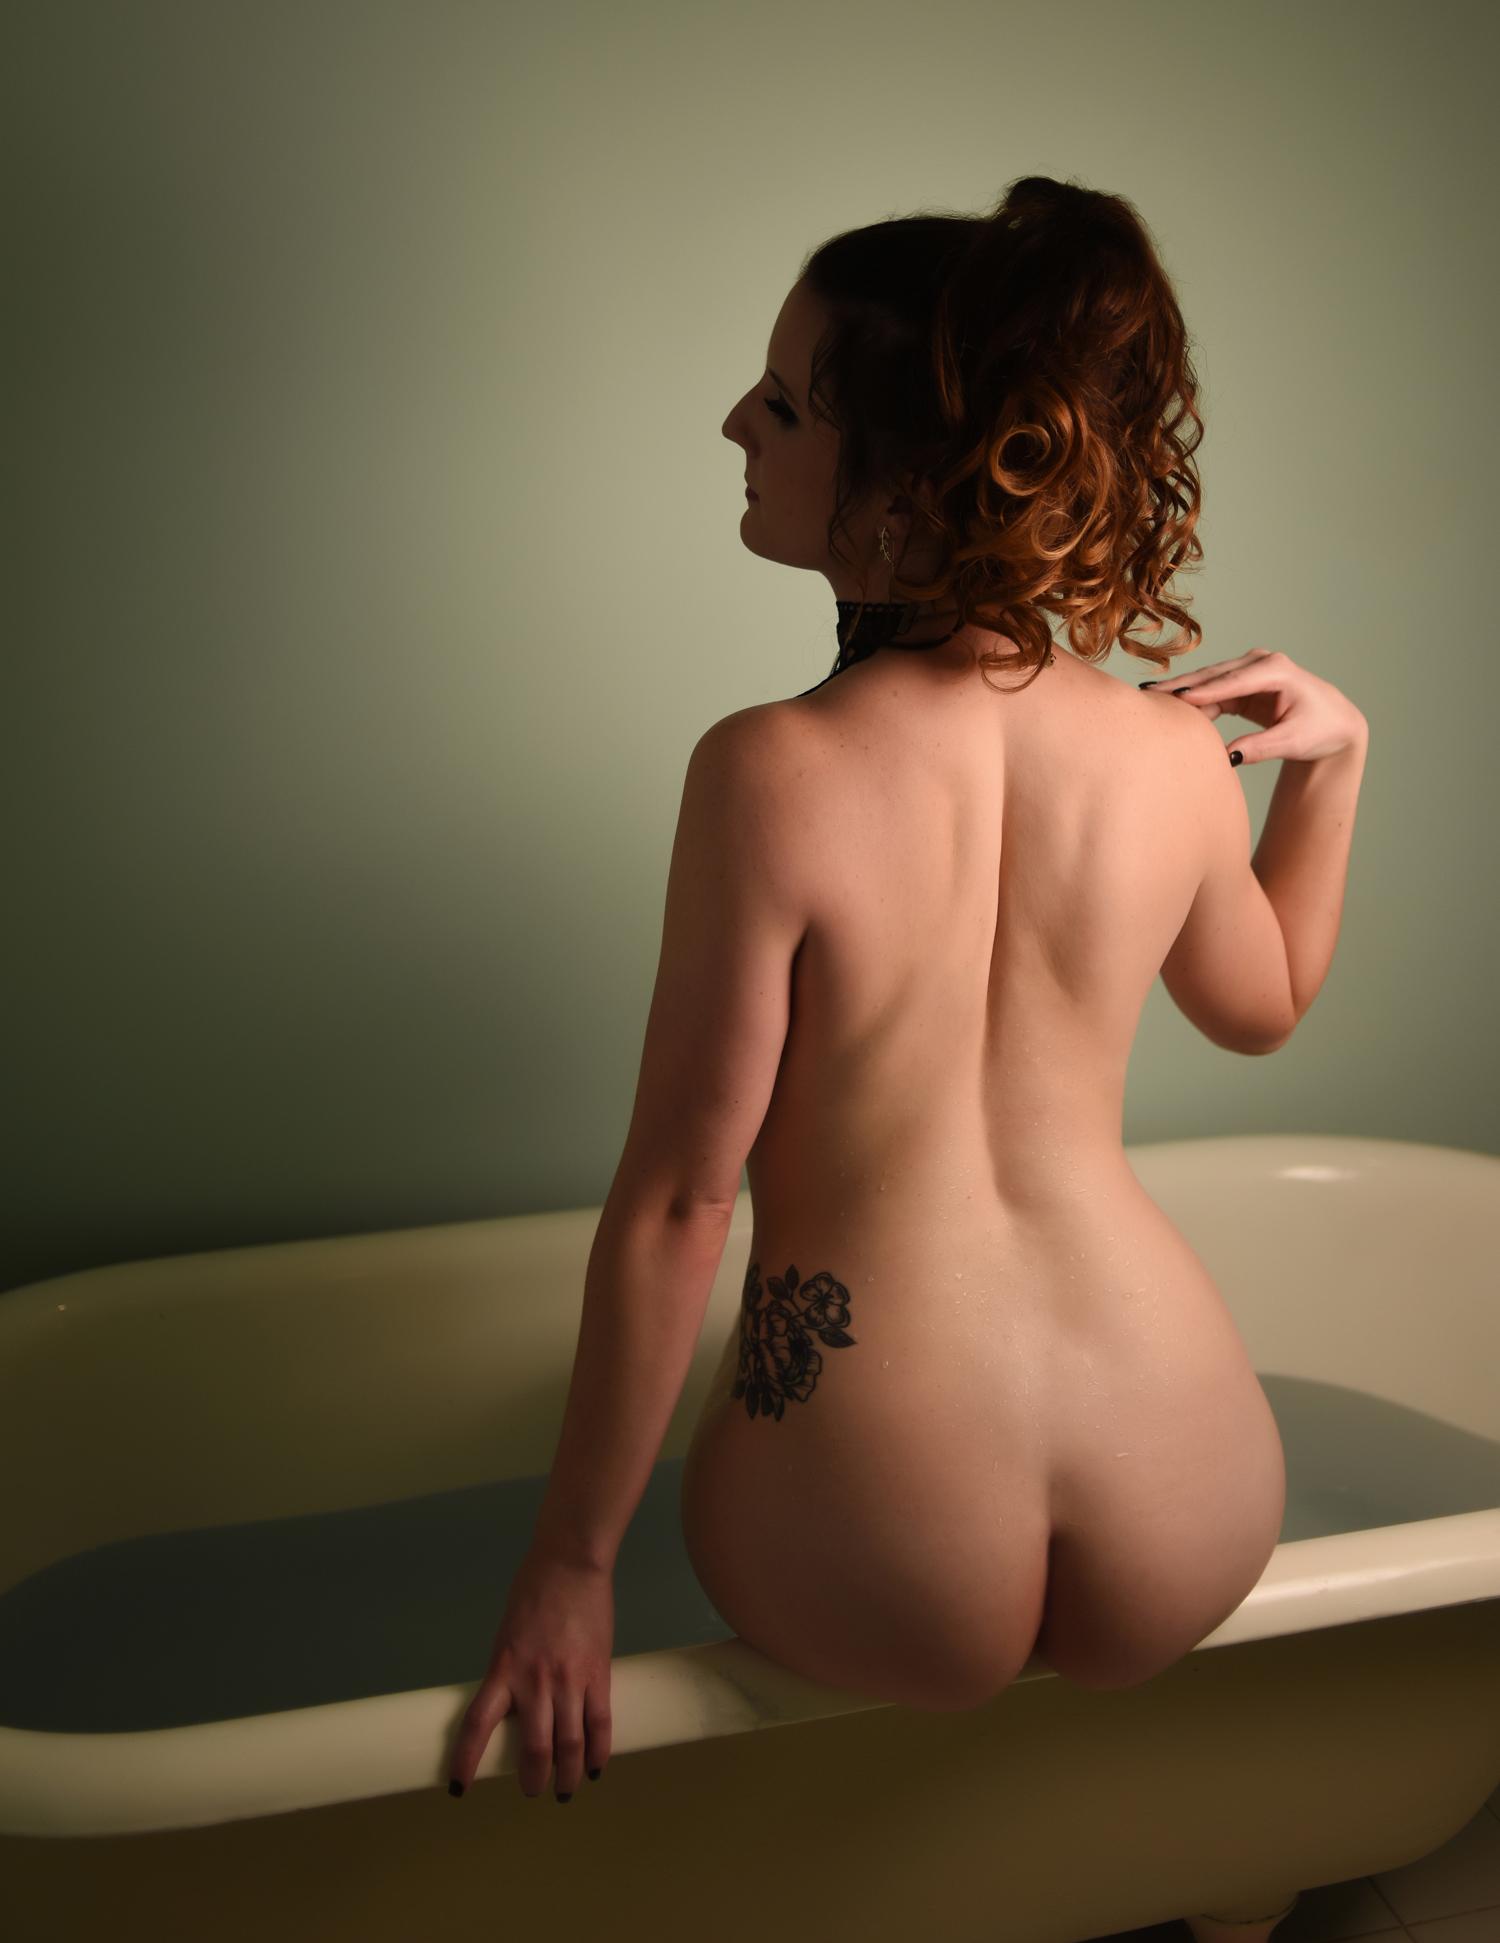 Bathtub Boudoir Photographer in Denver La Photographie 09.jpg